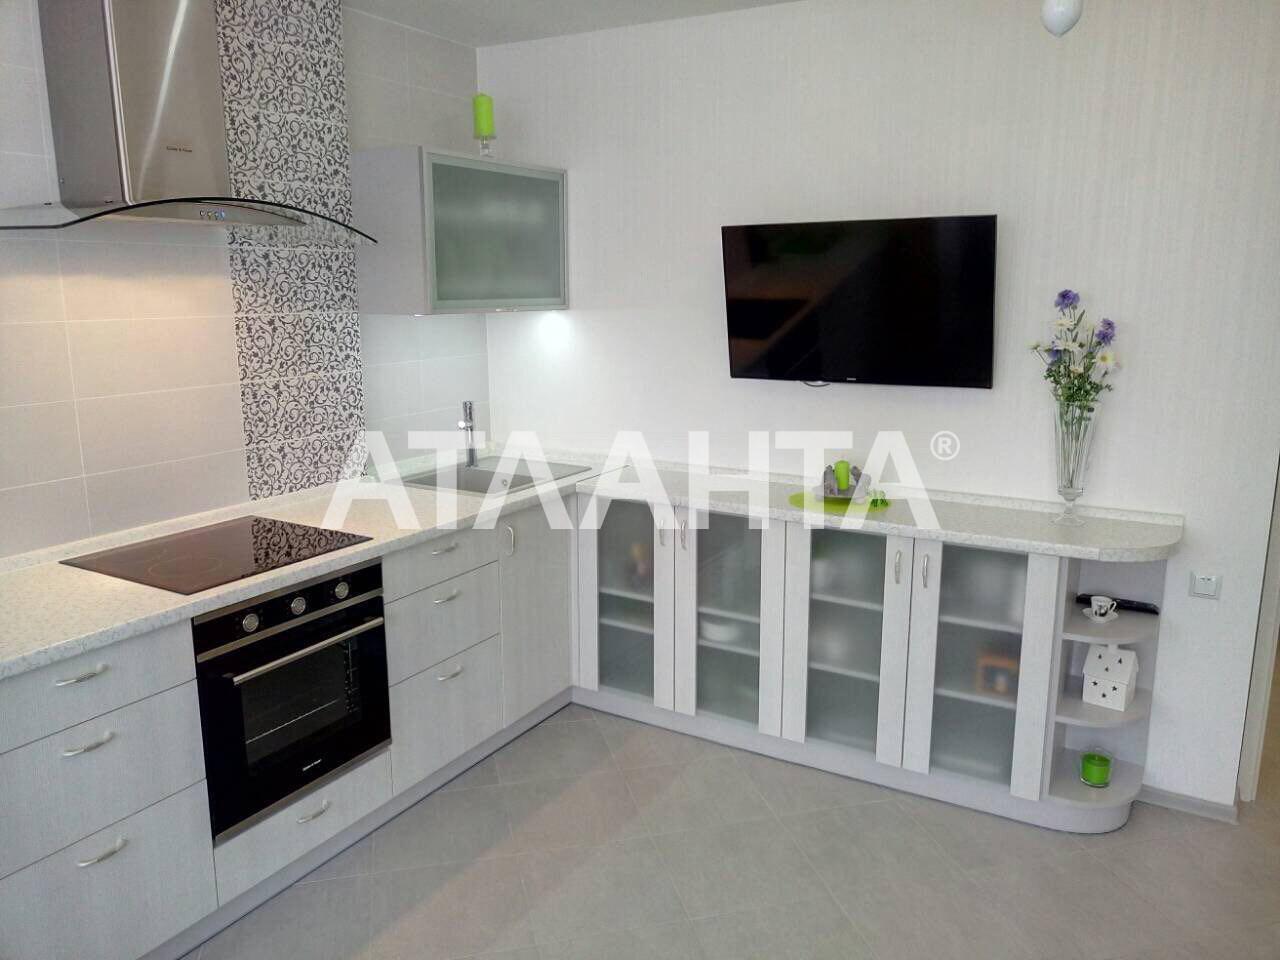 Продается 1-комнатная Квартира на ул. Говорова Марш. — 110 000 у.е. (фото №4)